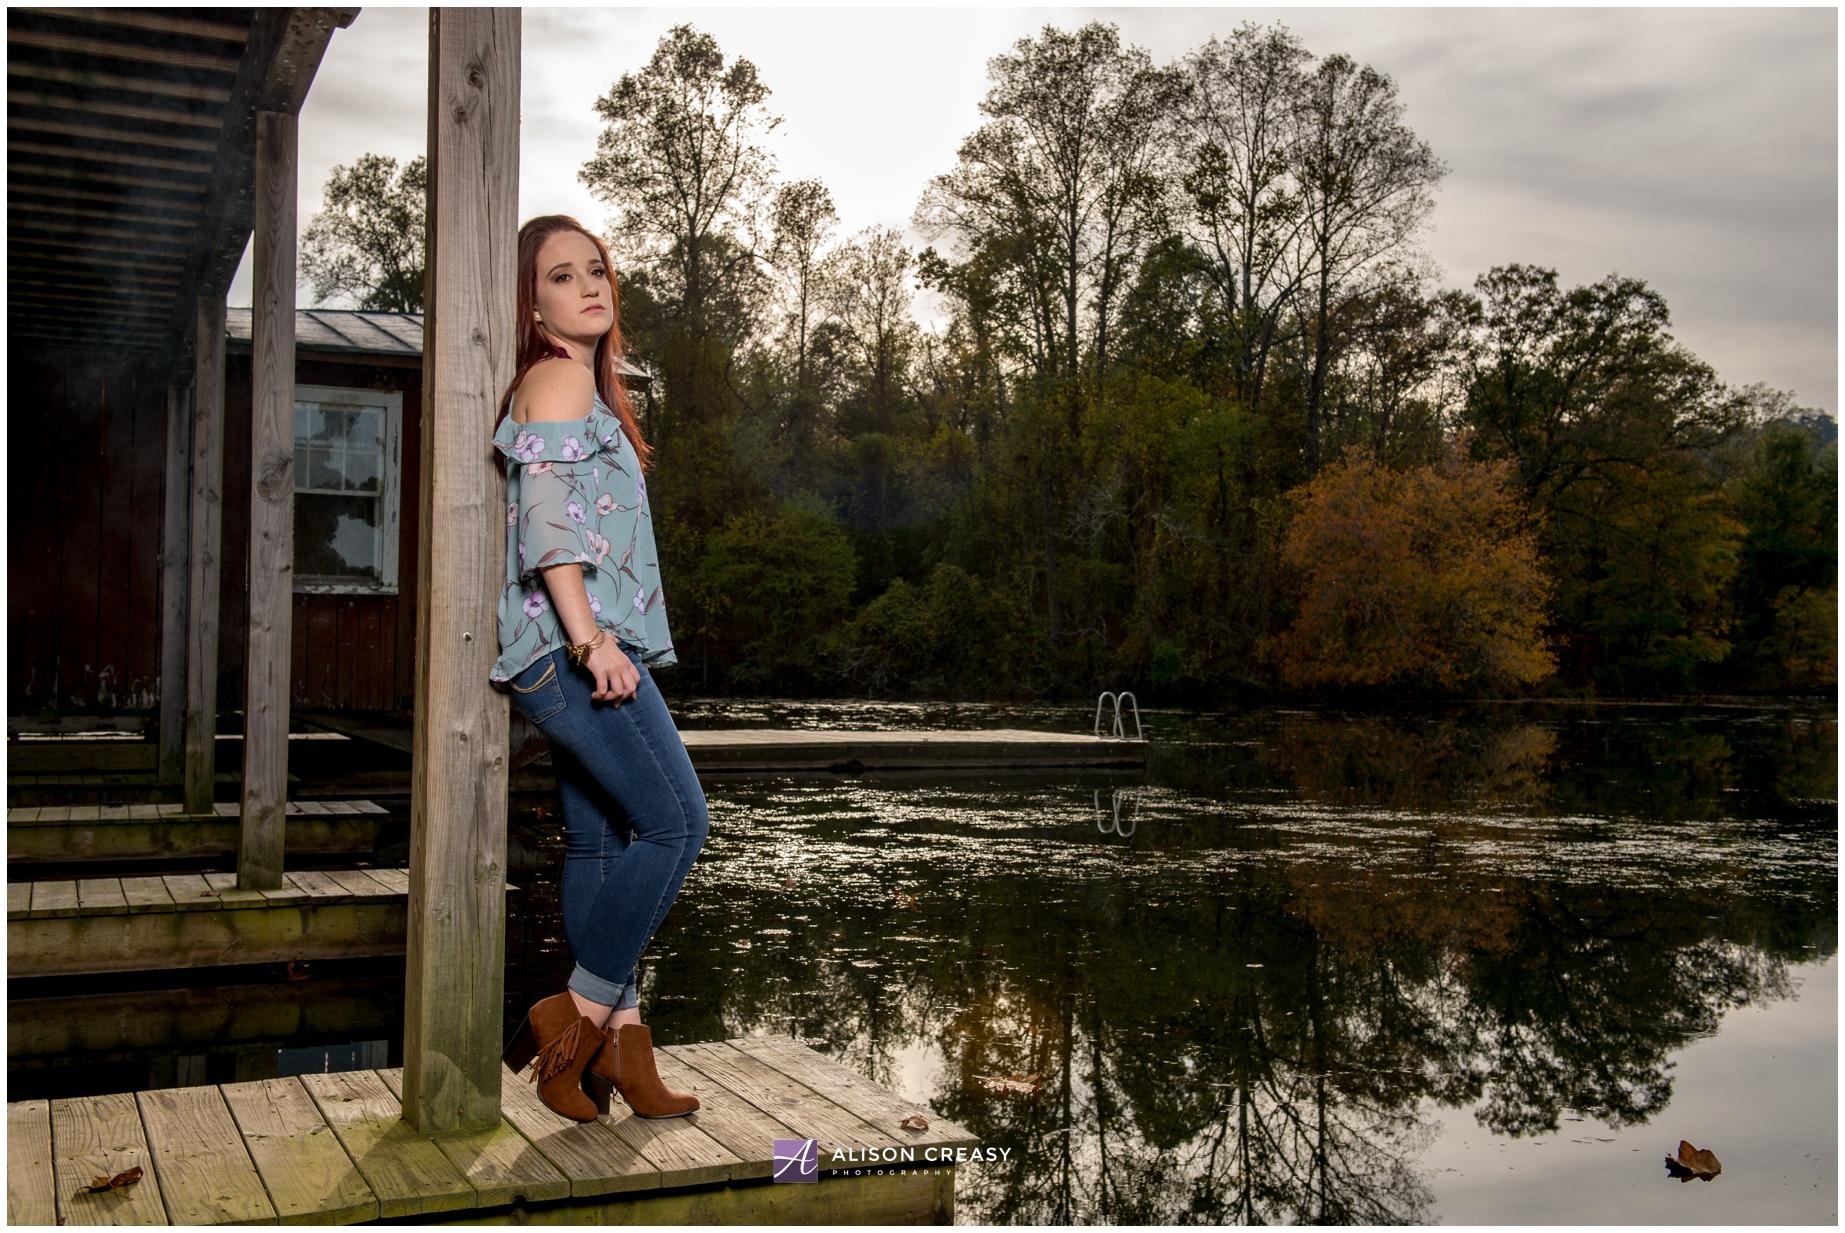 Alison-Creasy-Photography-Lynchburg-VA-Photographer_0952.jpg